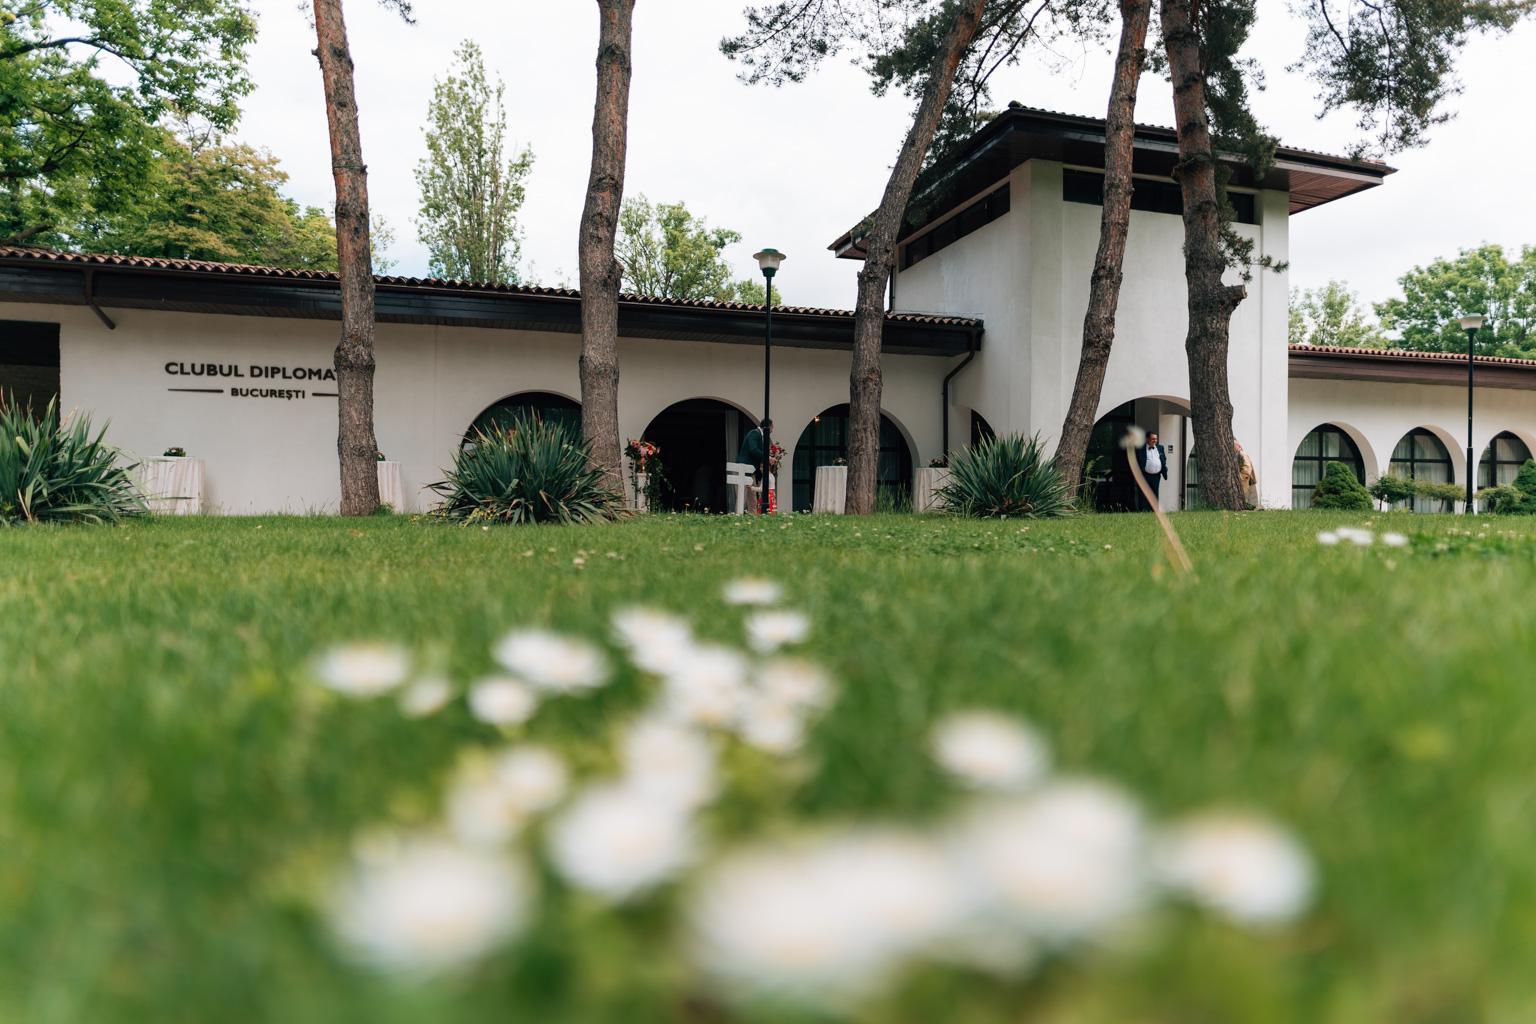 Locatii de nunta in aer liber  | Unde ne facem nunta in natura?